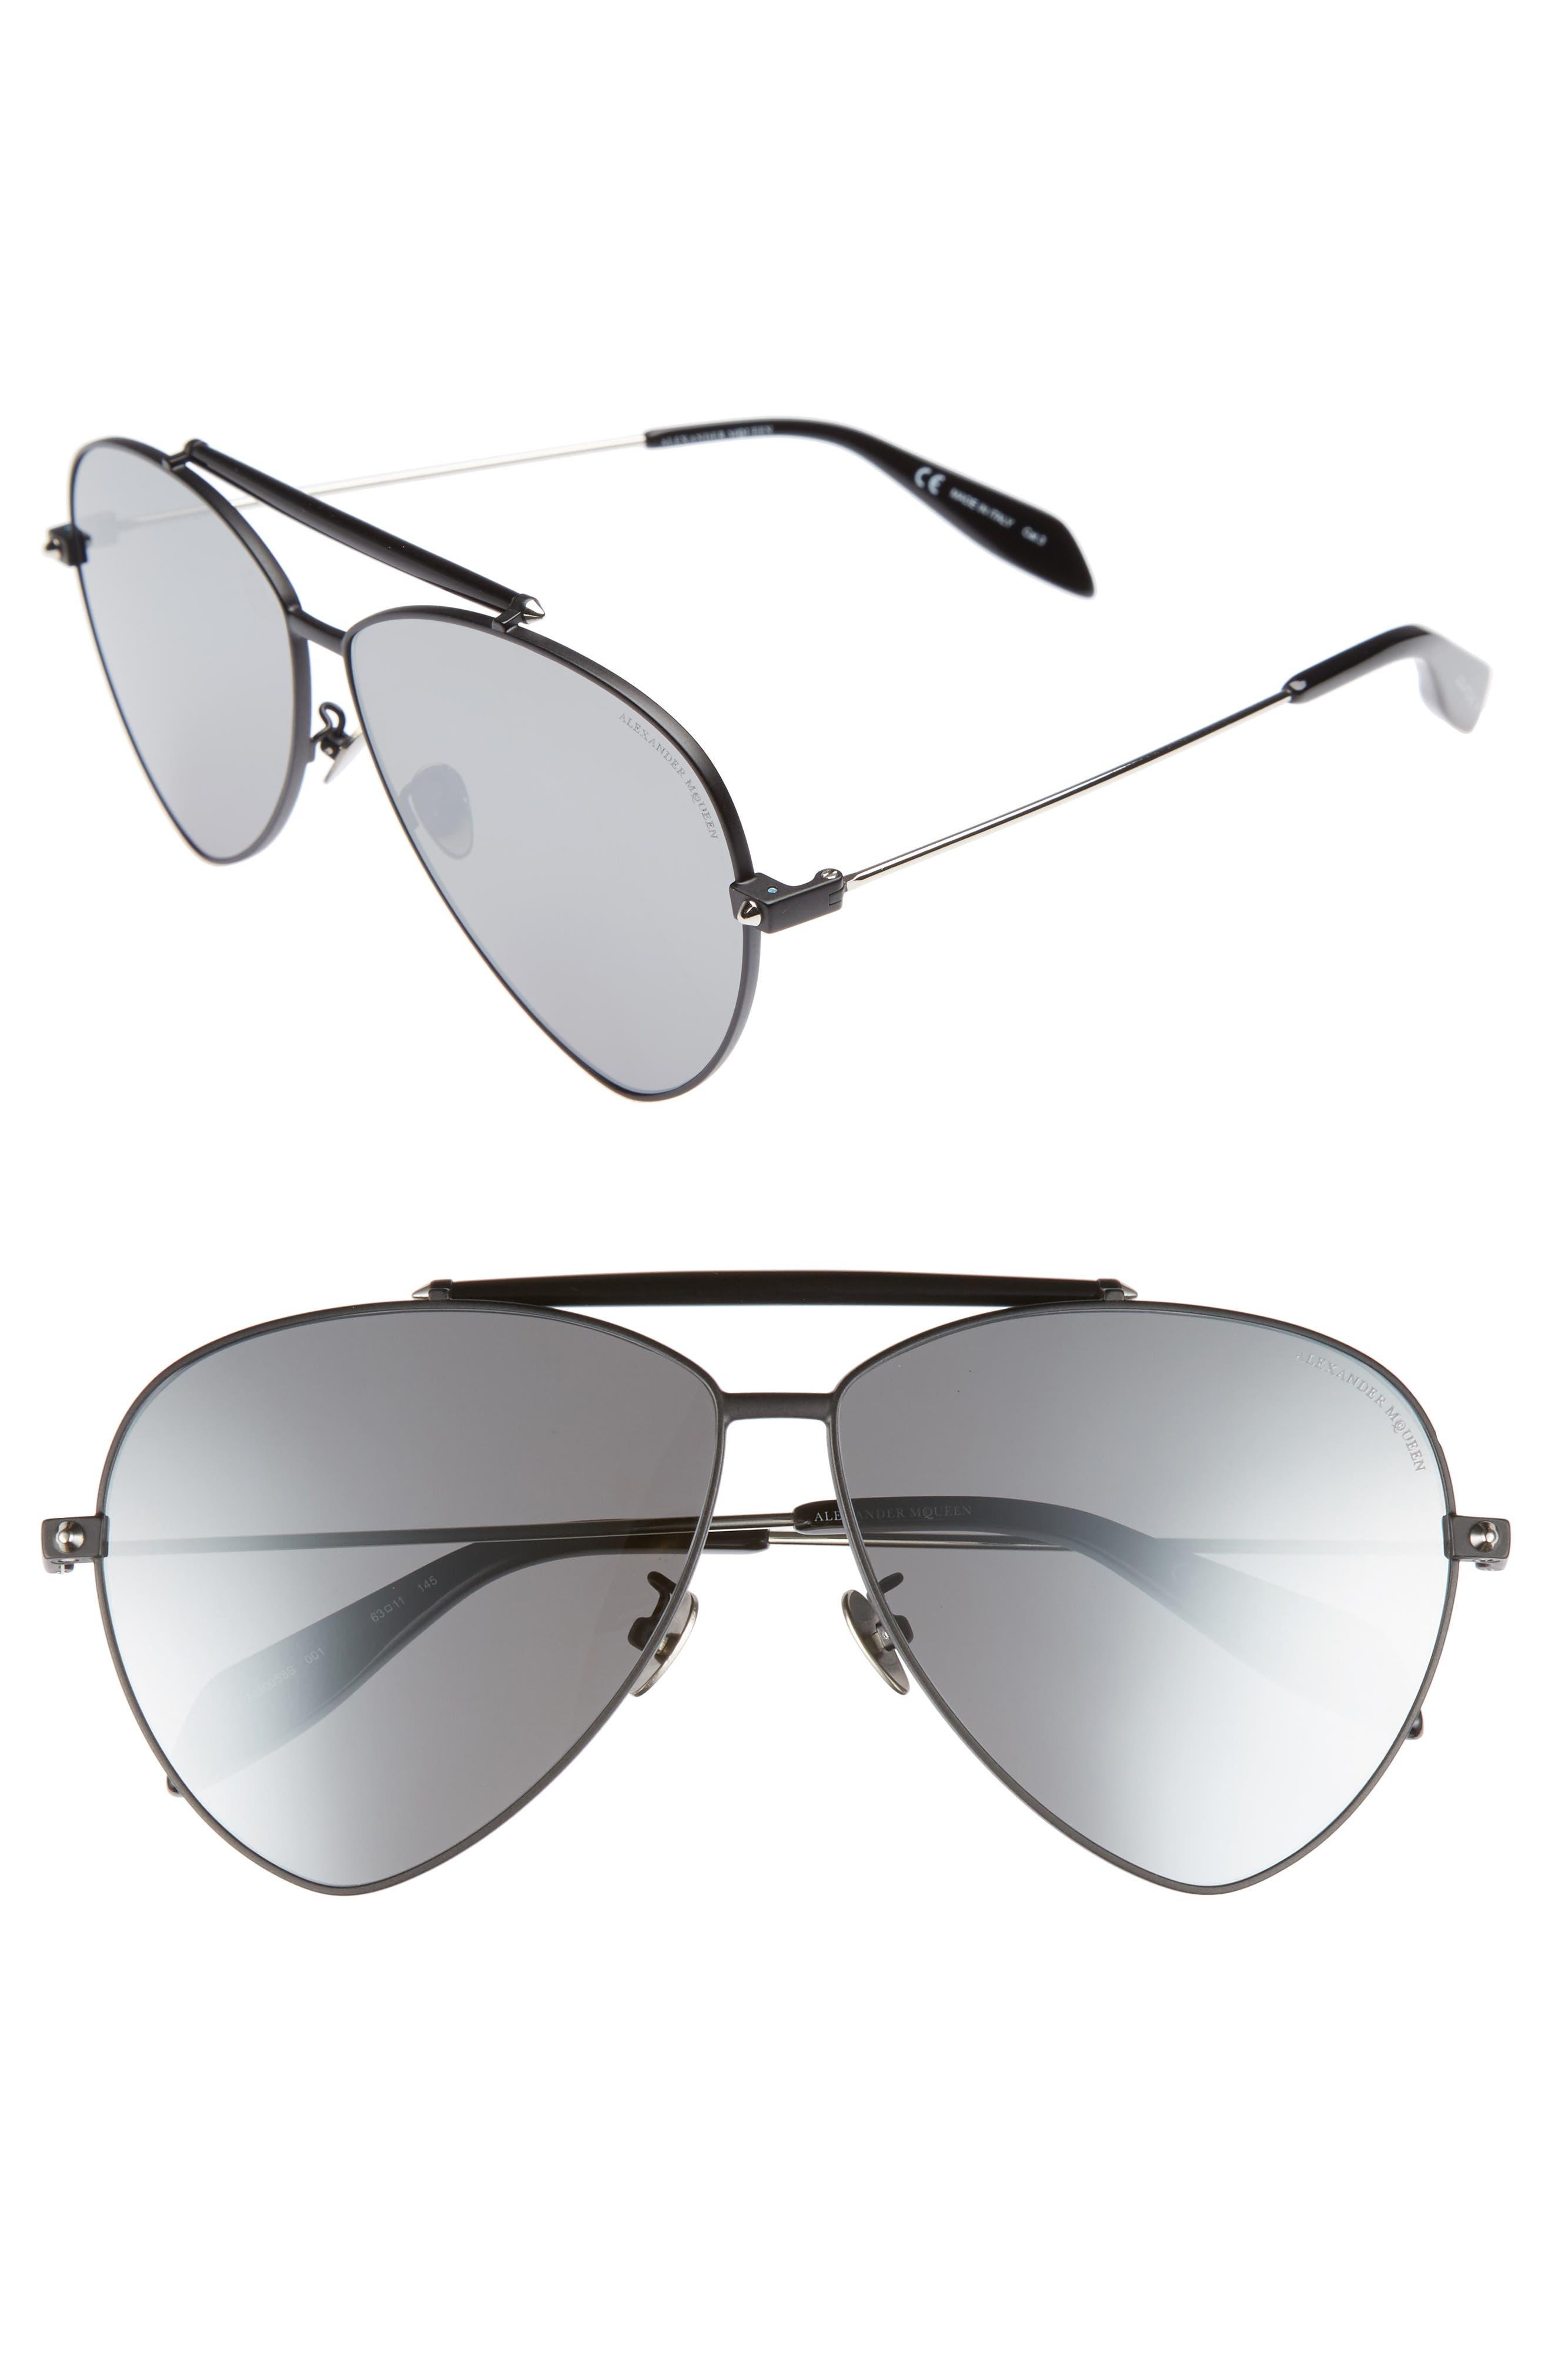 63mm Oversize Aviator Sunglasses,                             Main thumbnail 1, color,